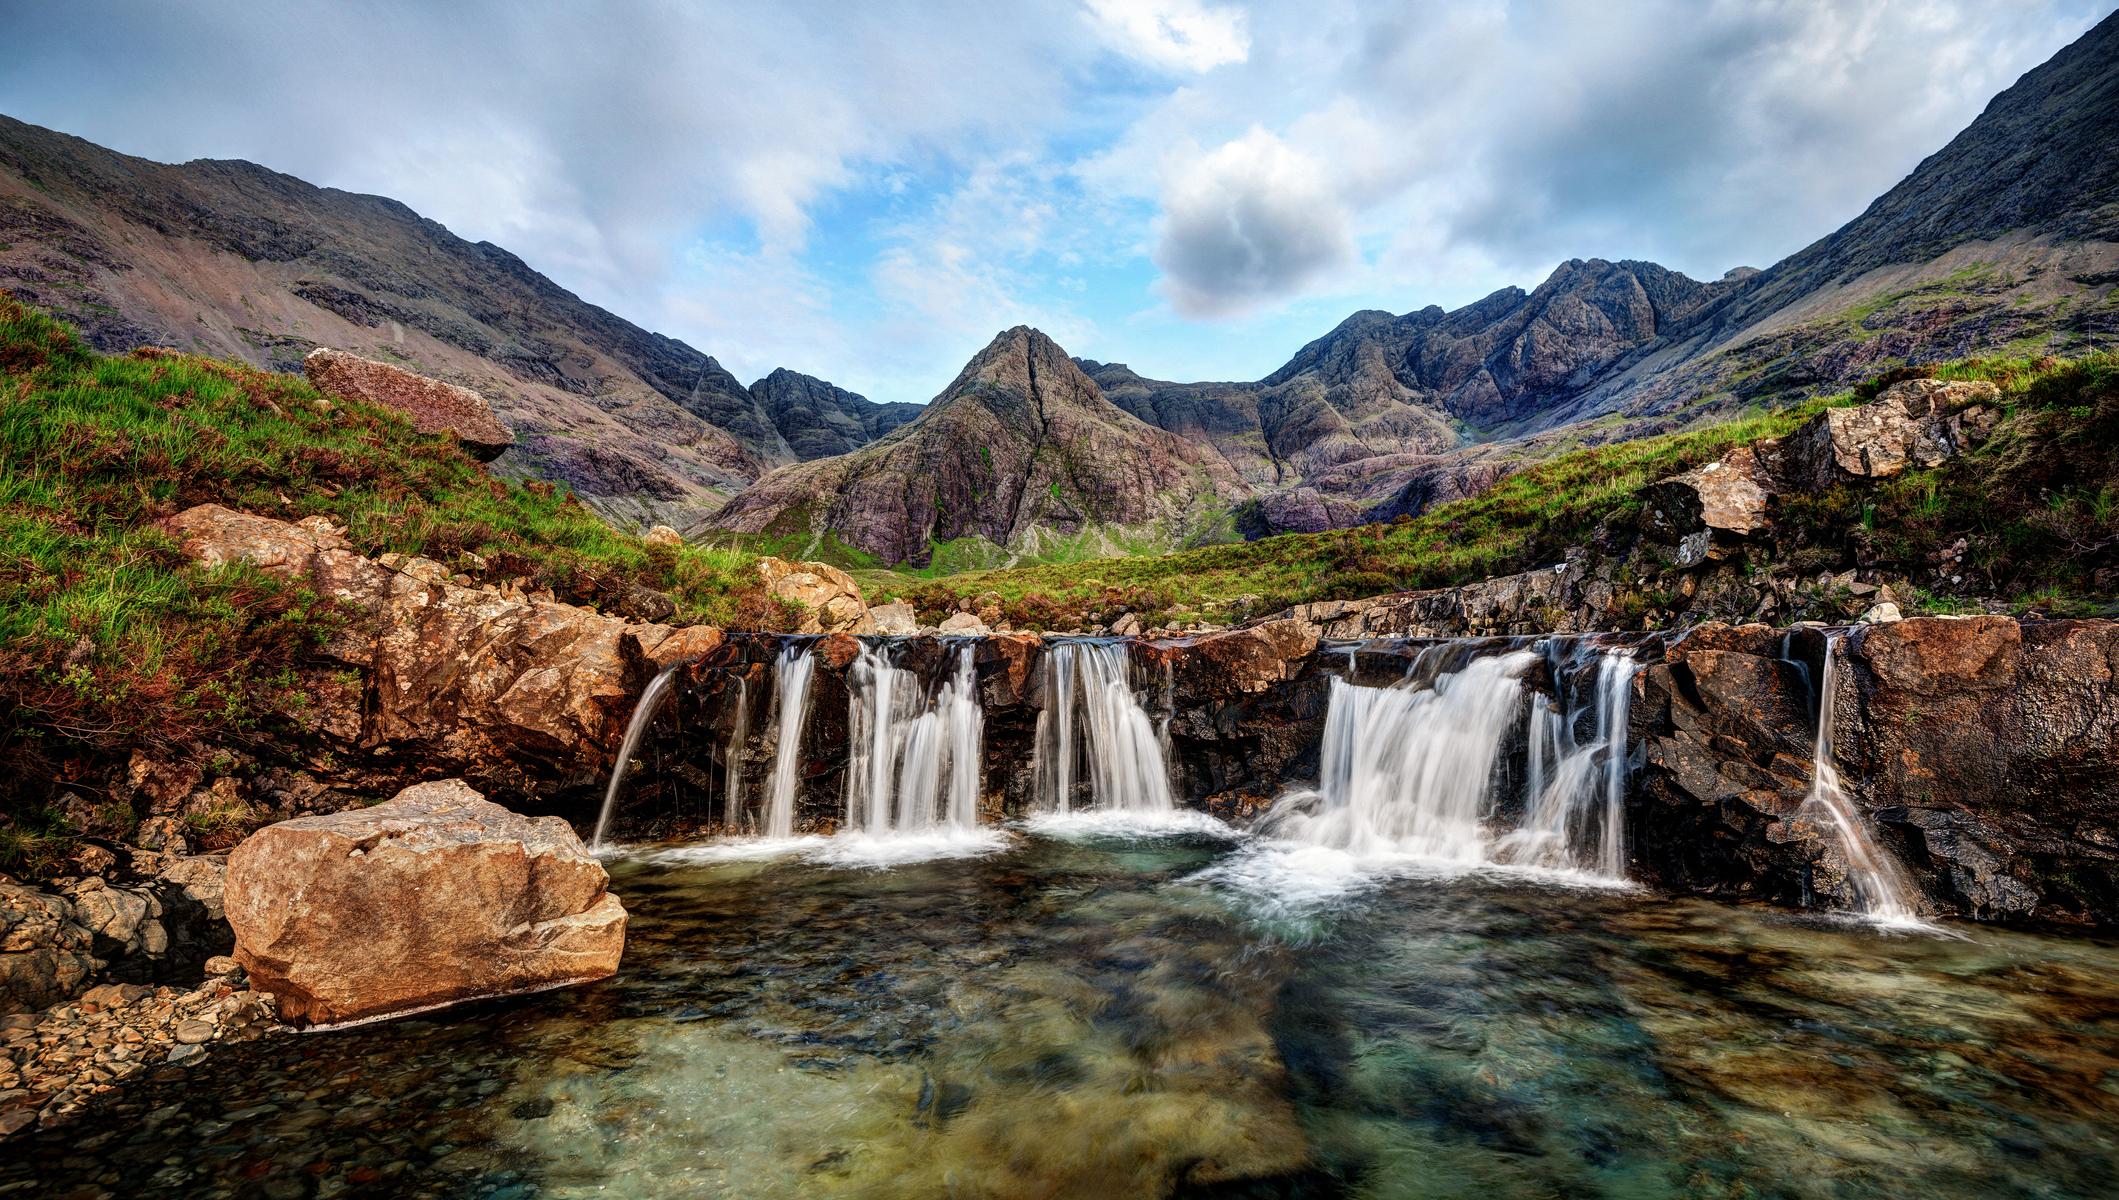 Wild swimming in the Fairy Pools, Skye